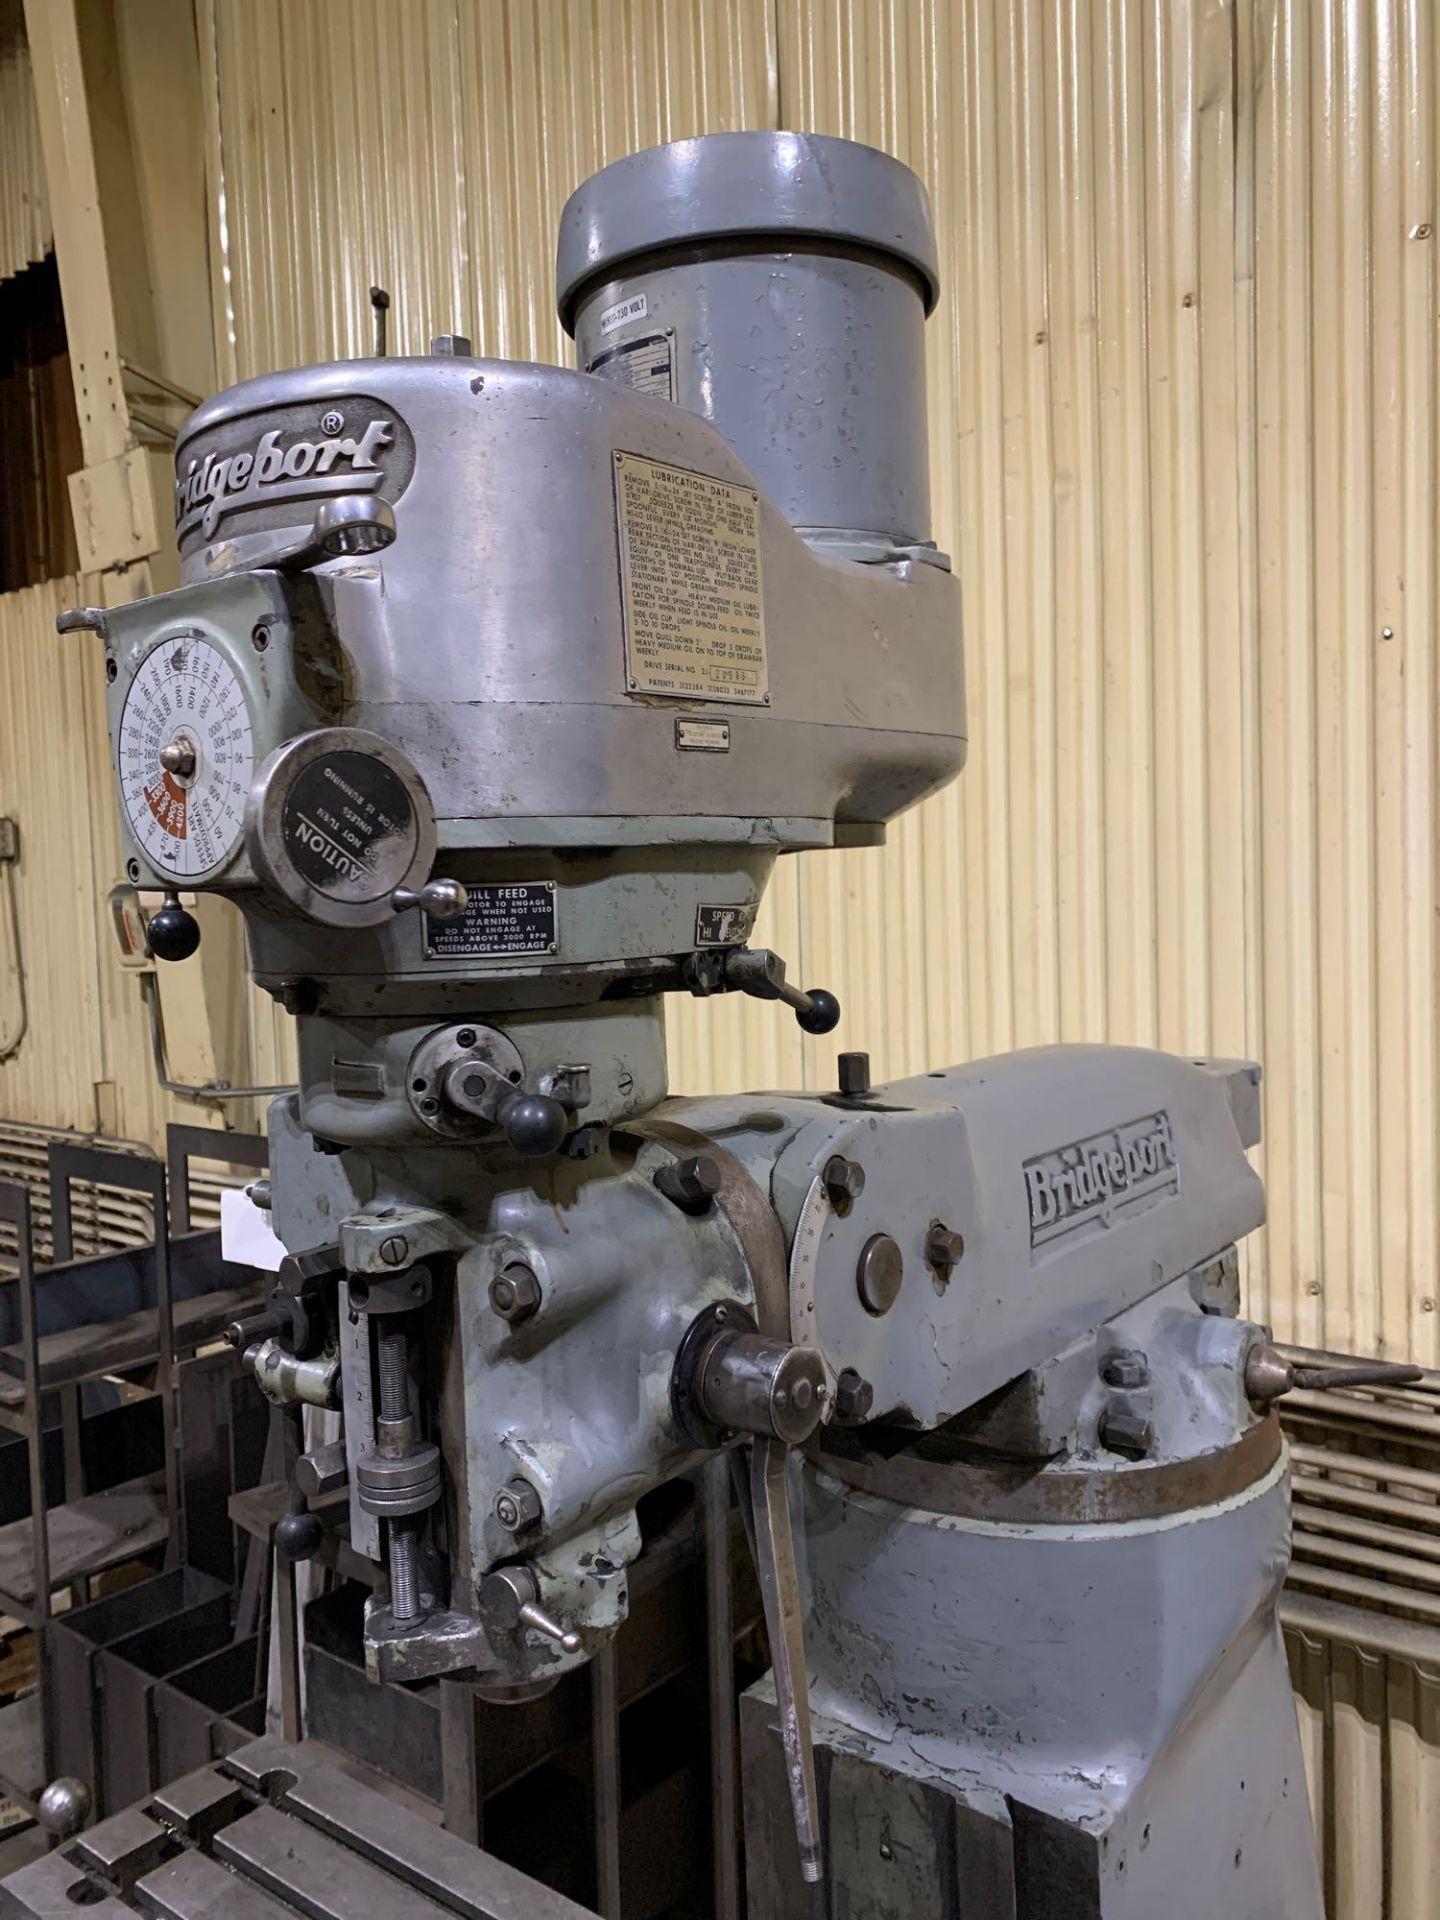 "Bridgeport 2J Vertical Milling Machine Variable Speed Head S/N 132833 CAPACITIES Table size: 9"" X 42 - Image 5 of 12"